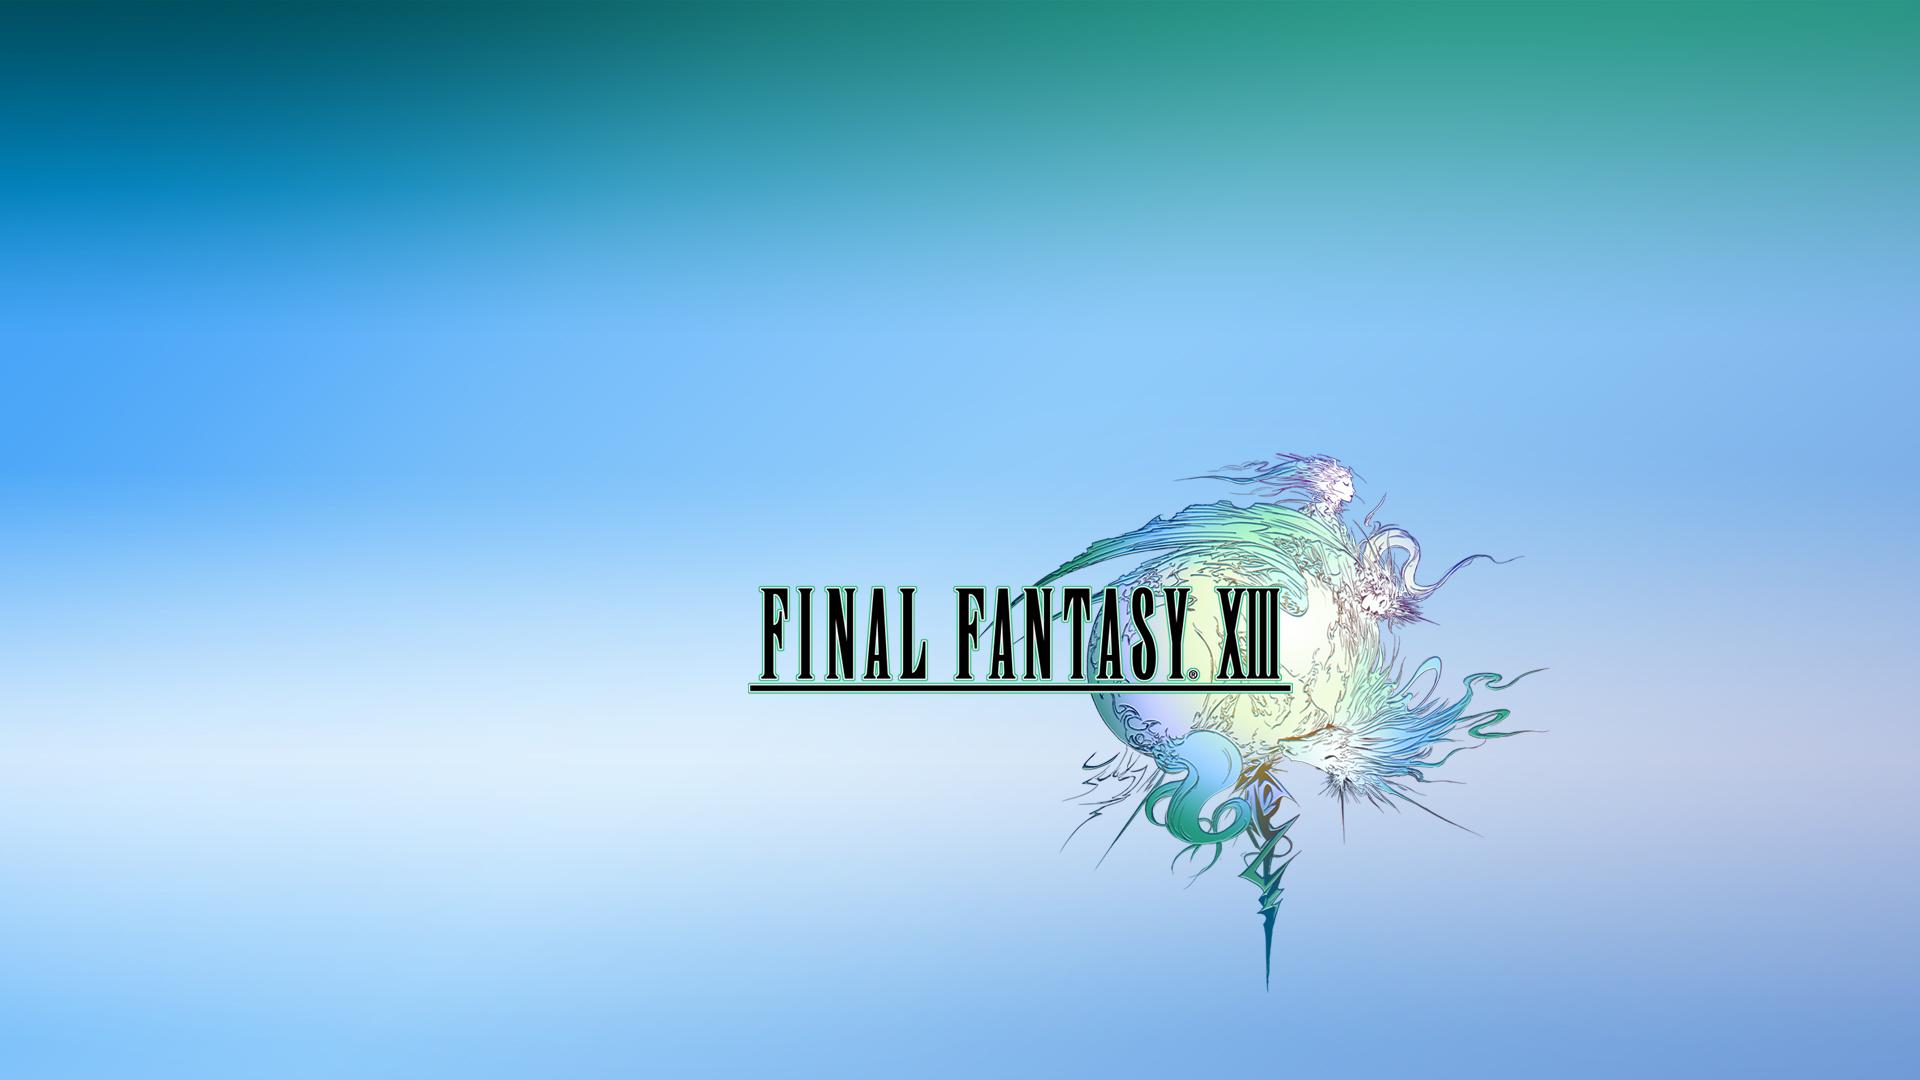 final fantasy logo ps3 wallpapers actual 1920x1080 1920x1080